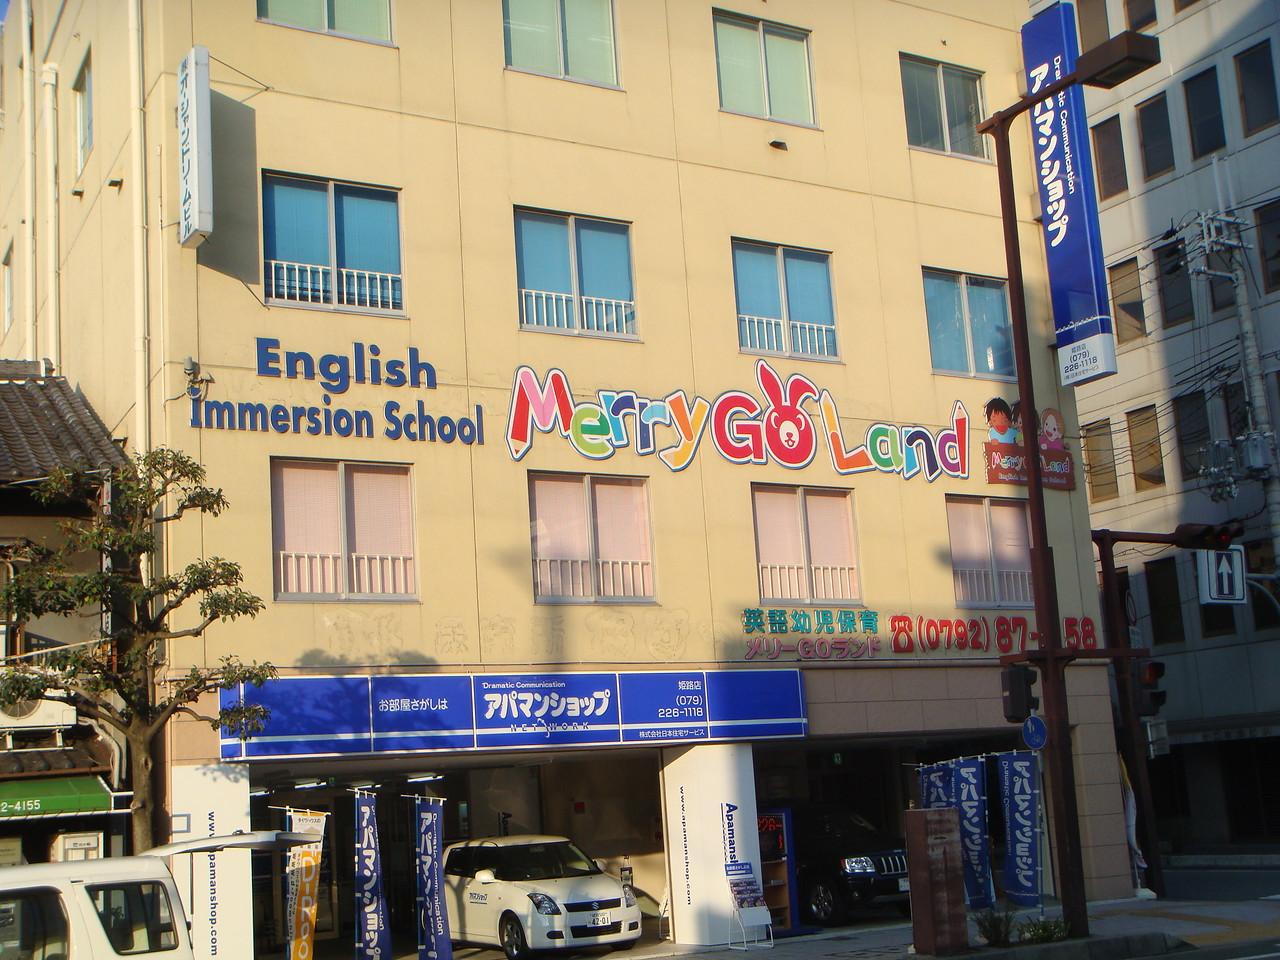 The facade of an English school in Tokyo, Japan